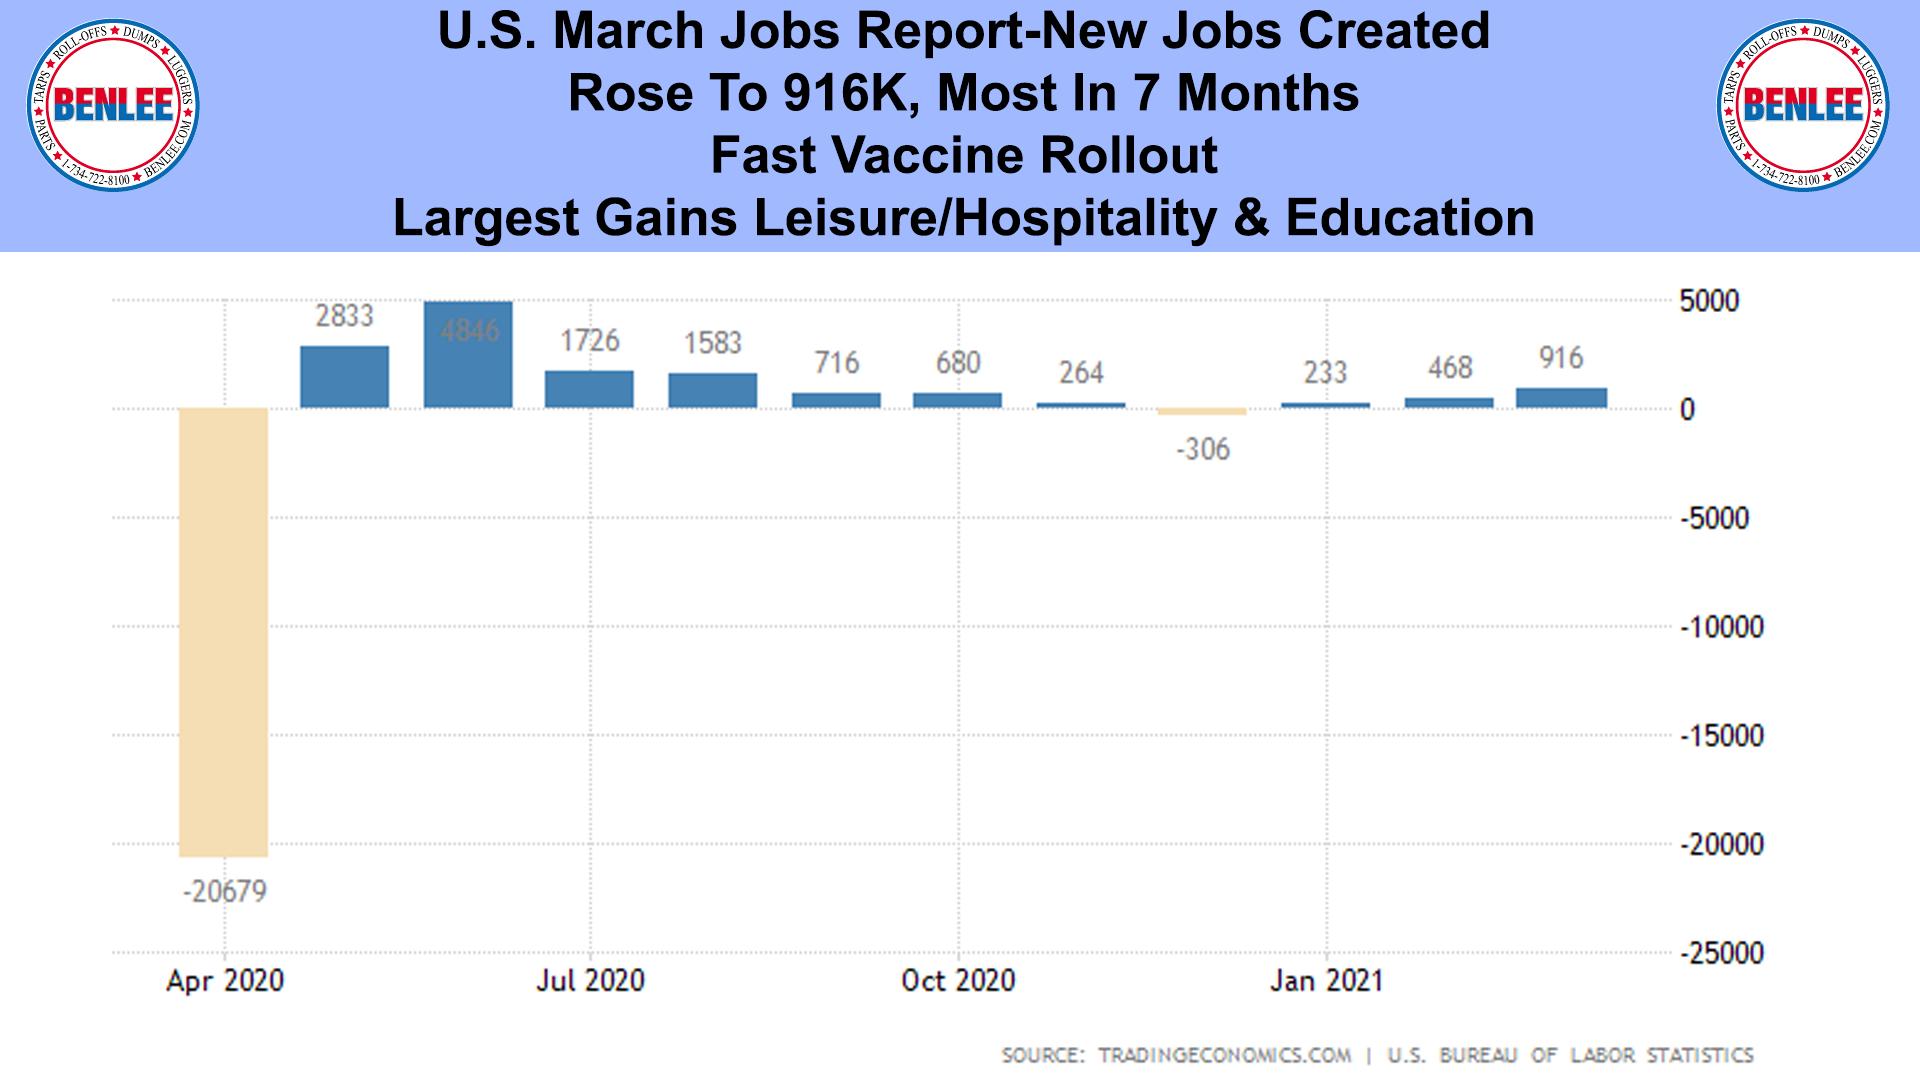 U.S. March Jobs Report